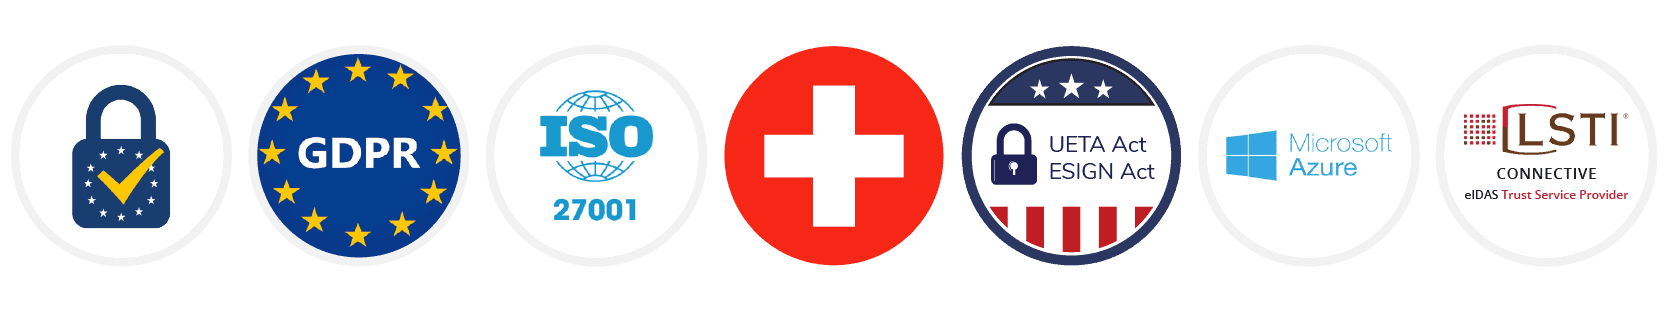 Compliancy logos